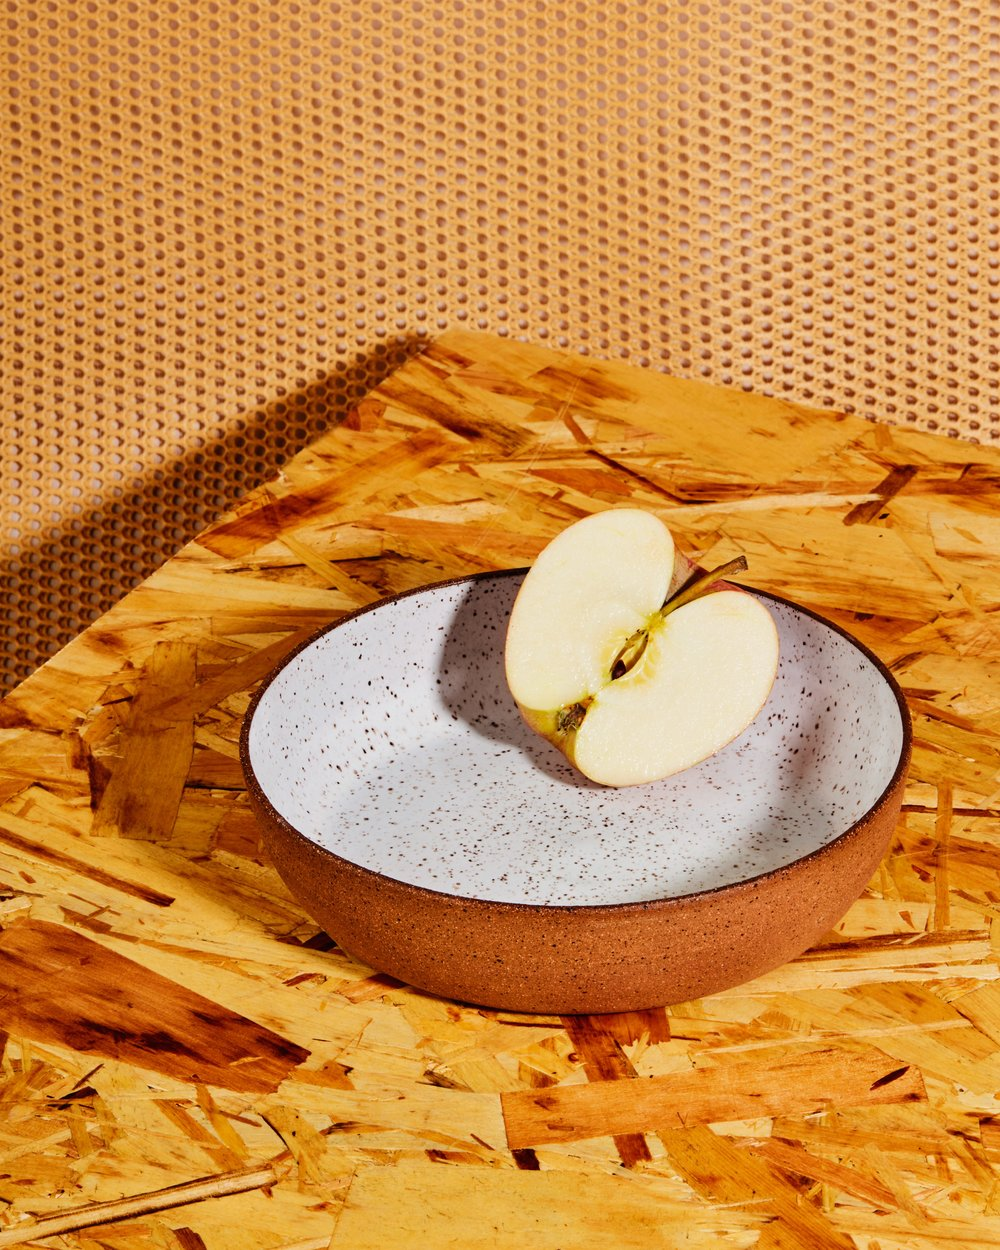 29072018-Wolfgang-Ceramics-5480 copy.jpg